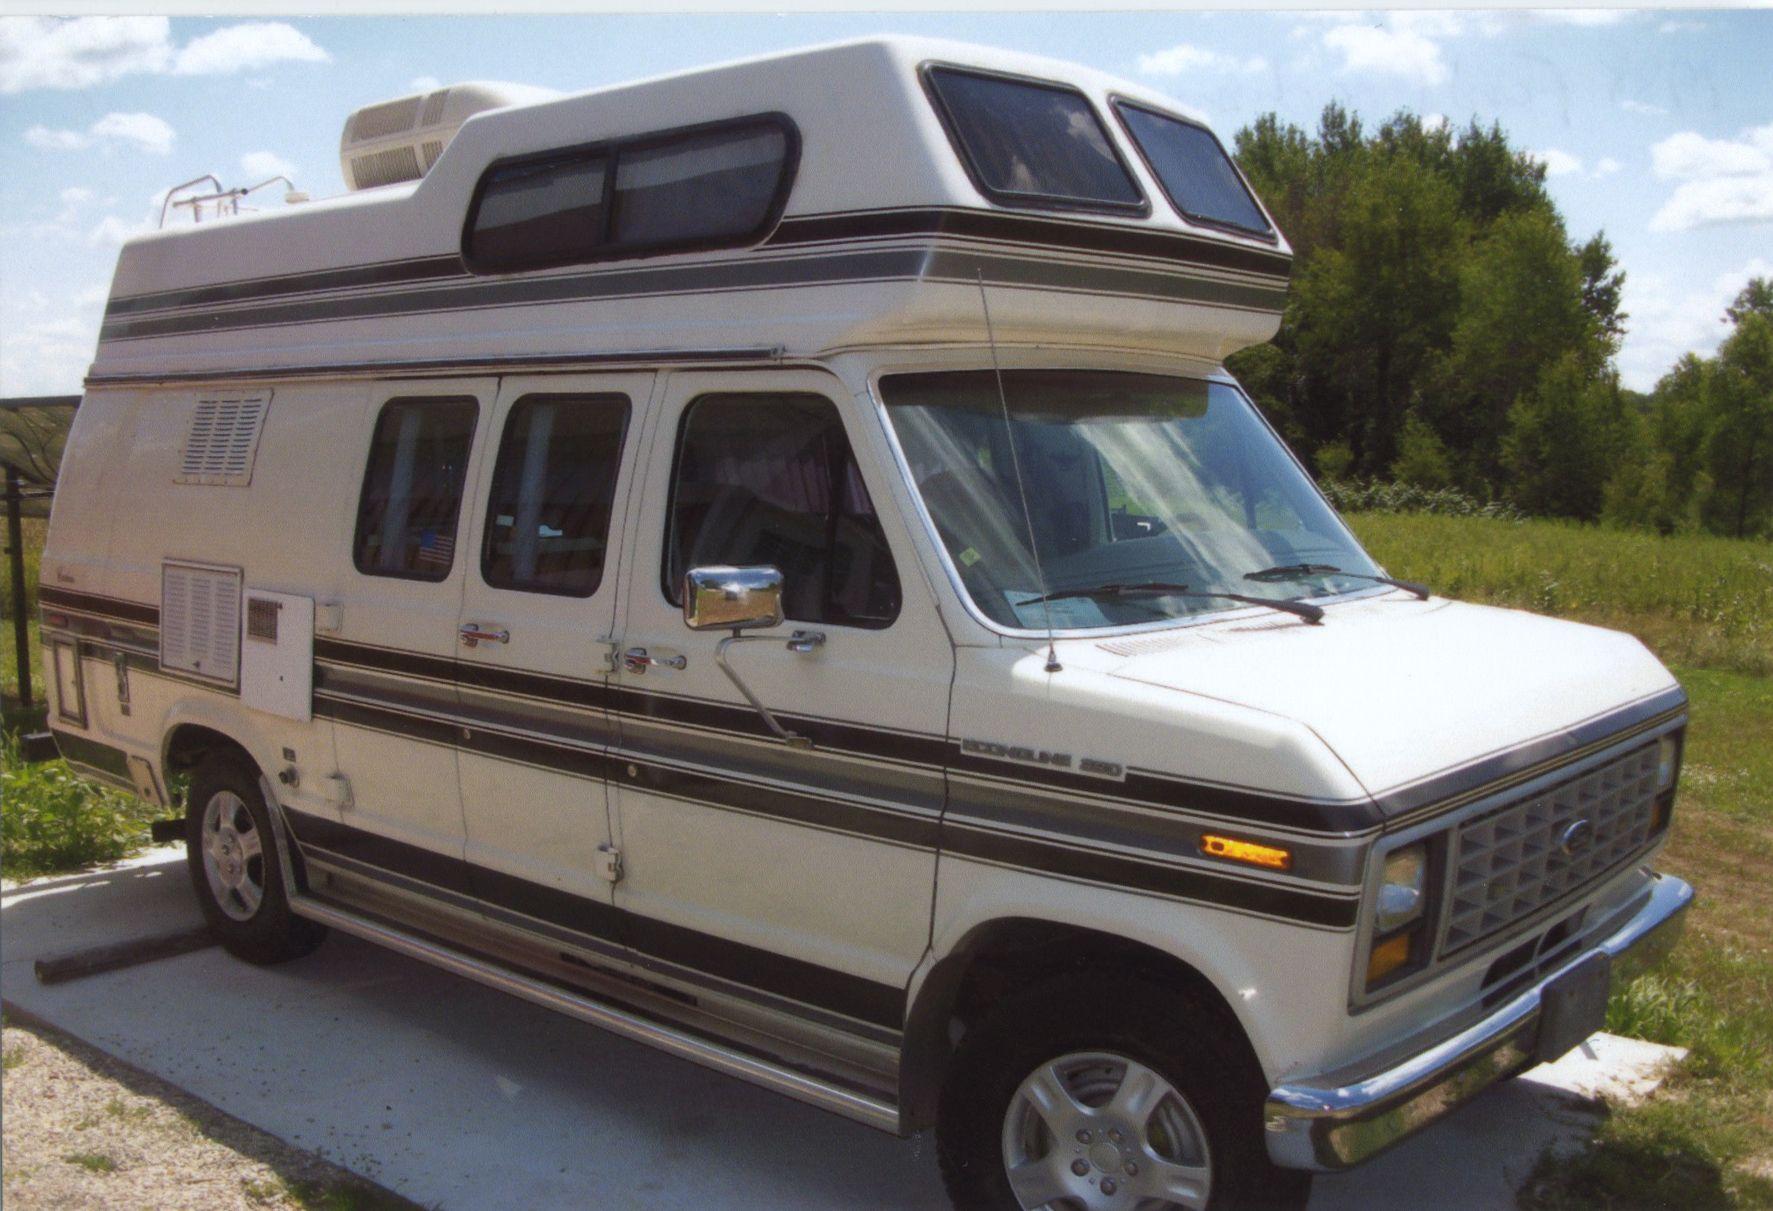 Ford Coachman 21FT. Motorhome